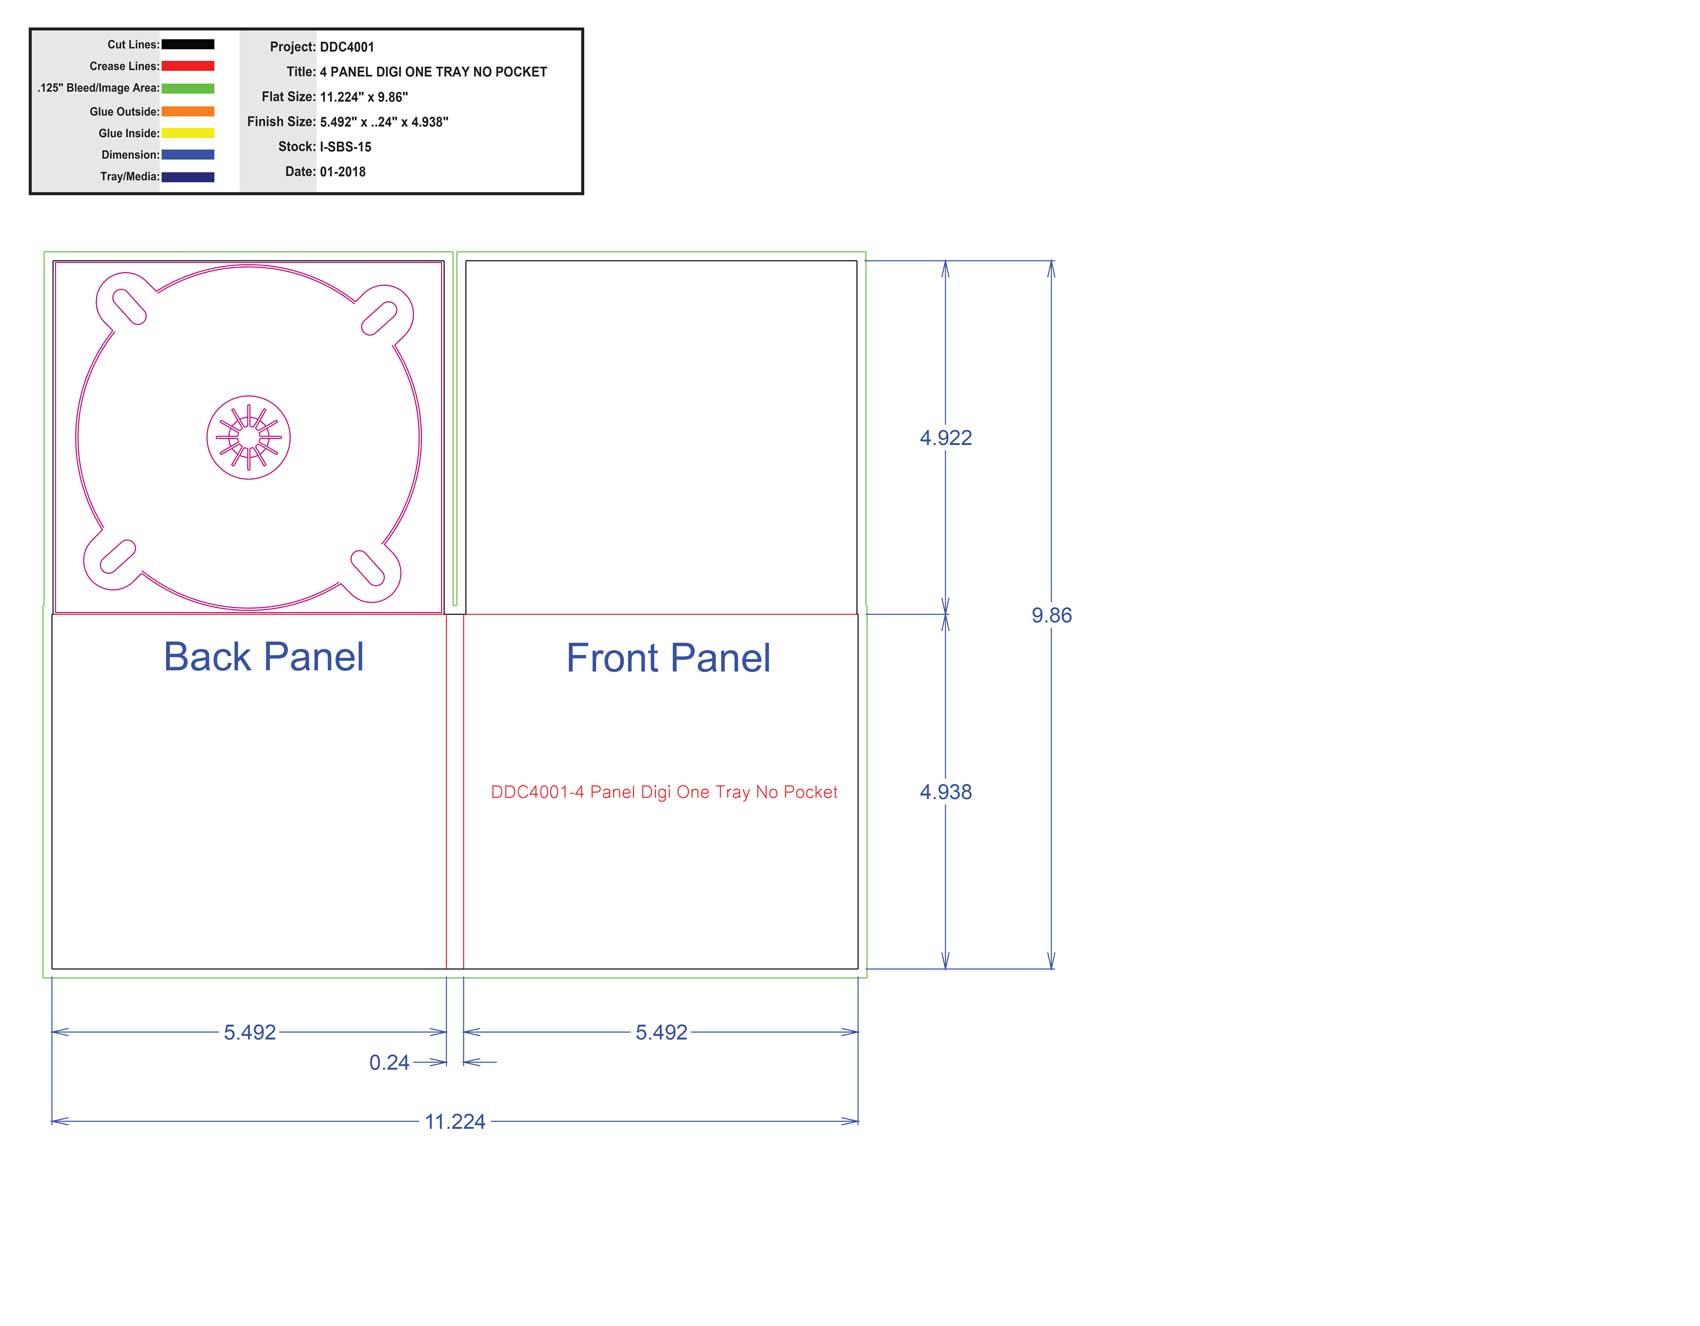 DDC4001-4 Panel Digi One Tray No Pocket